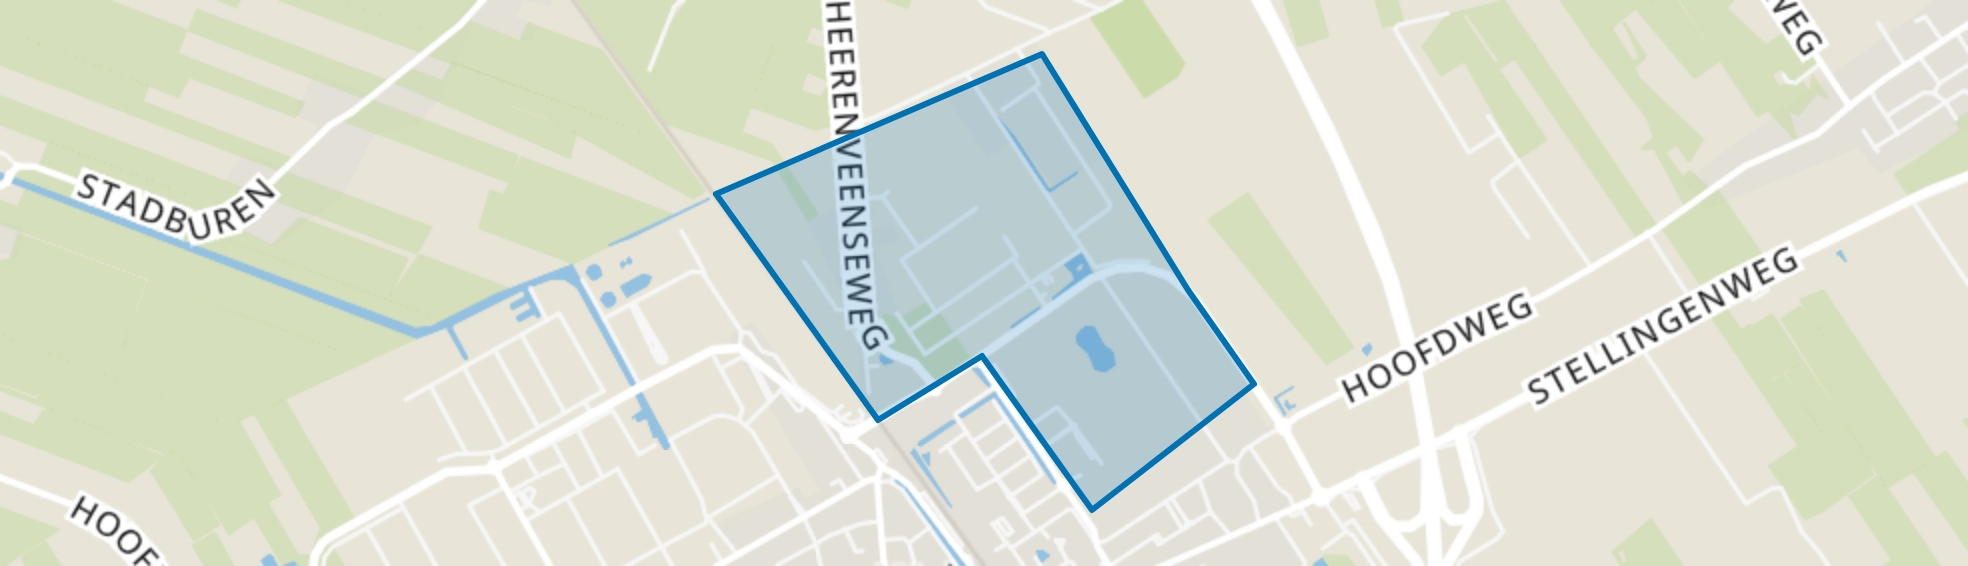 Wolvega-Wolvega Noord, Wolvega map